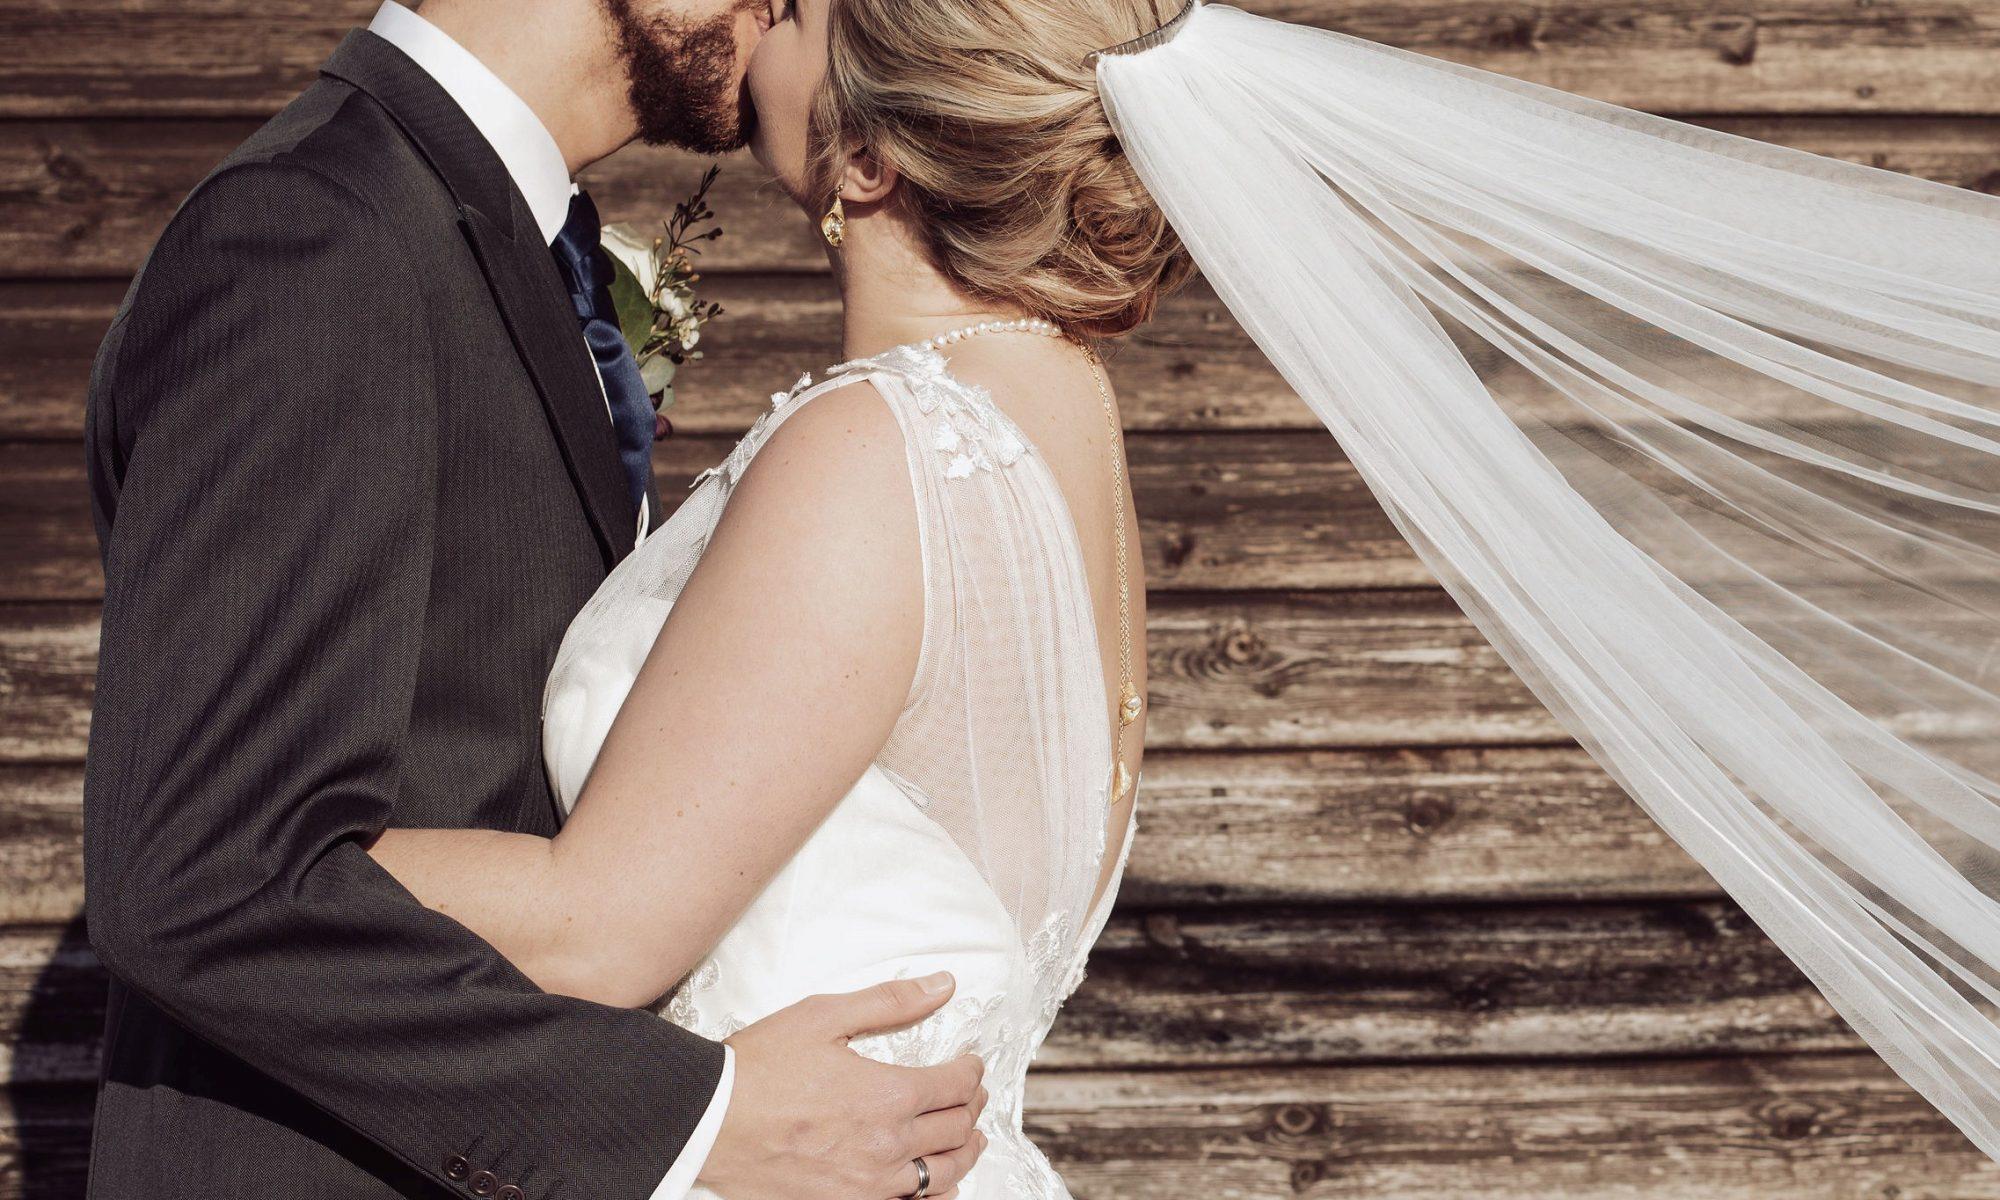 romantic wedding ideas for a bride